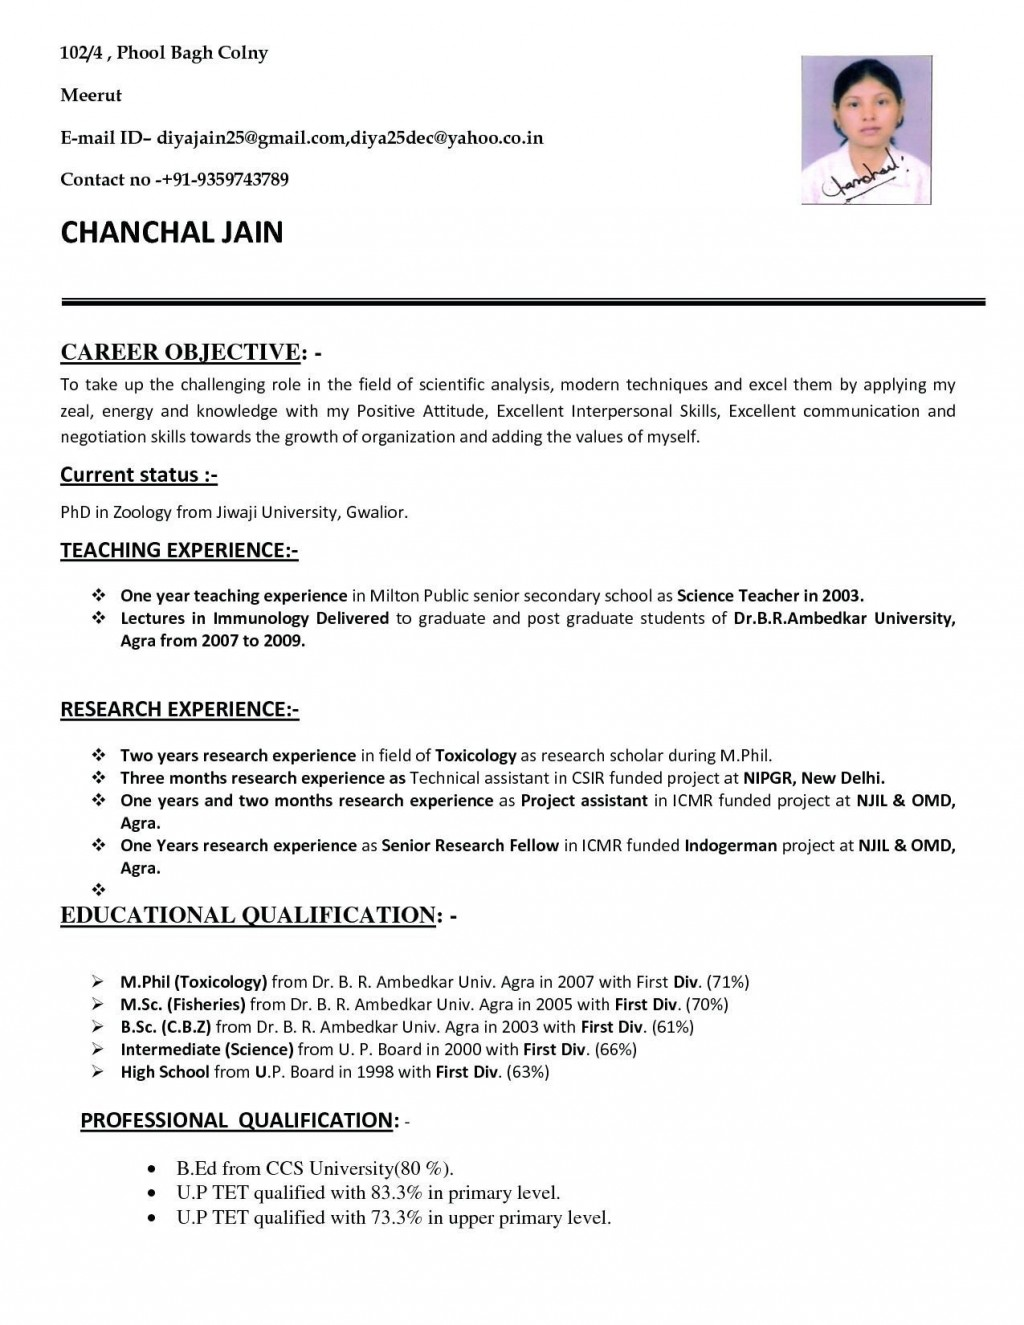 008 Impressive Resume Sample For Teaching Job In India Design  School Principal PositionLarge